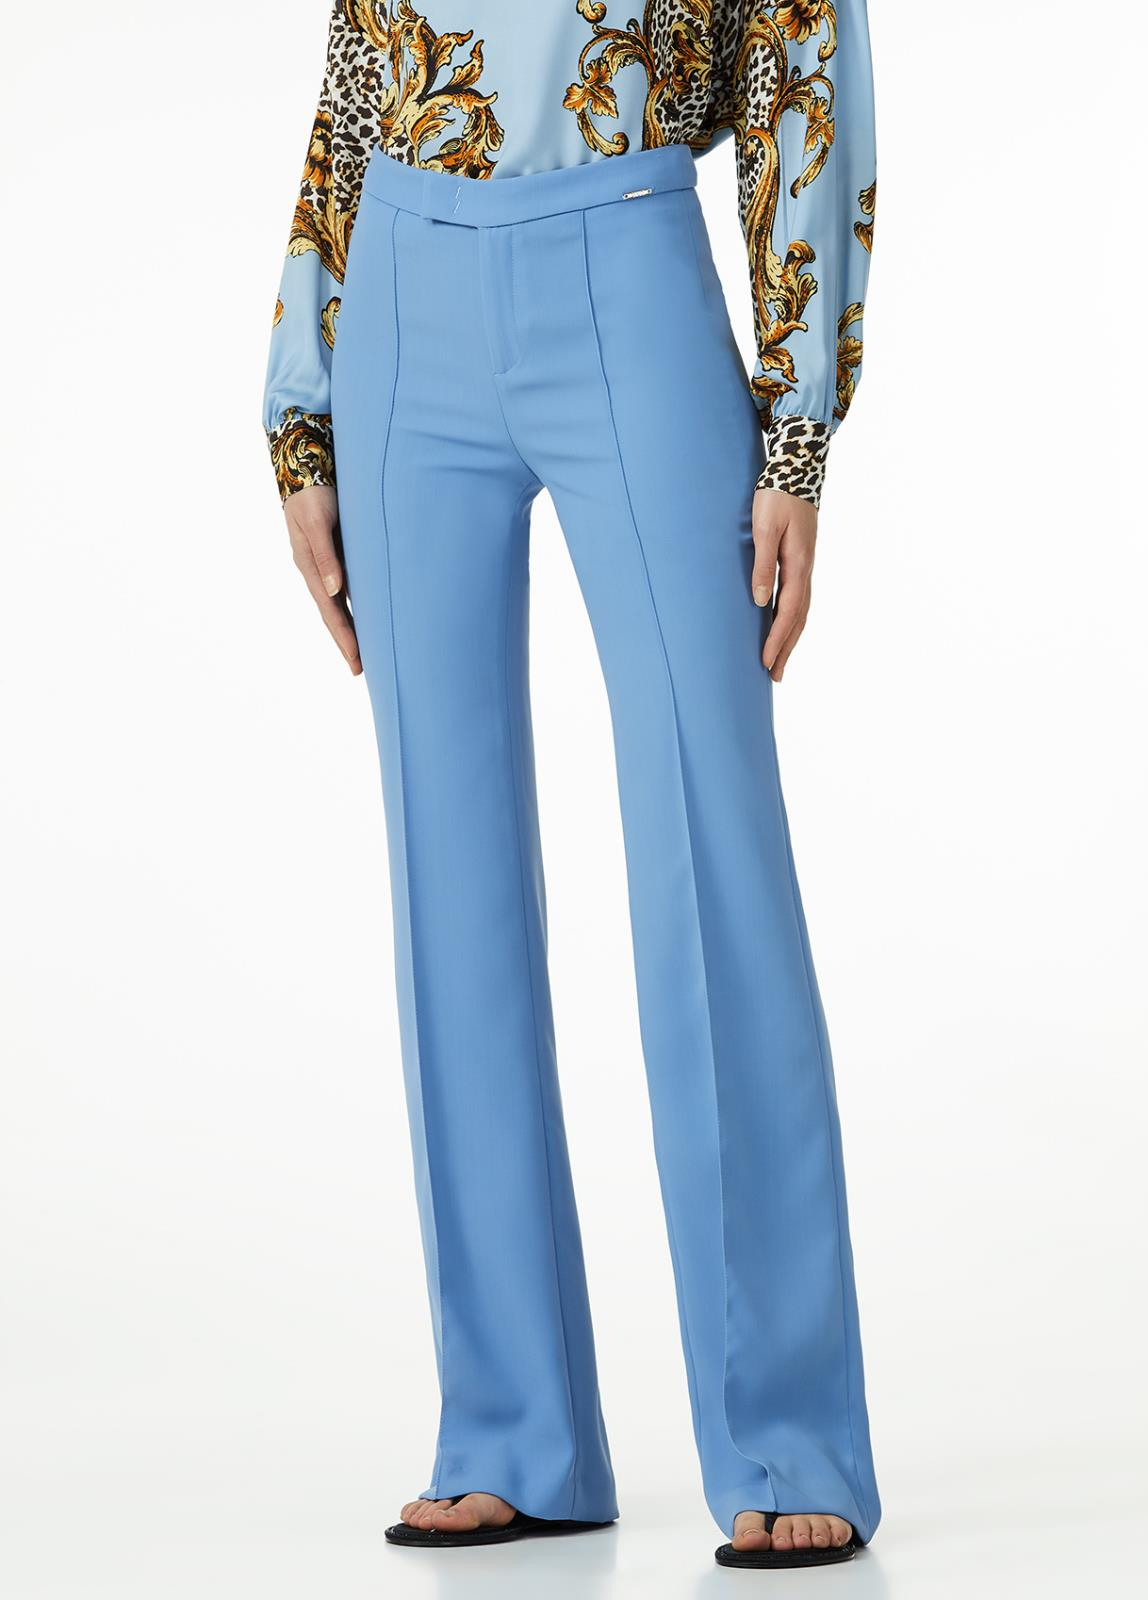 Pantalone tailleur a palazzo Liu Jo ea343fb6064